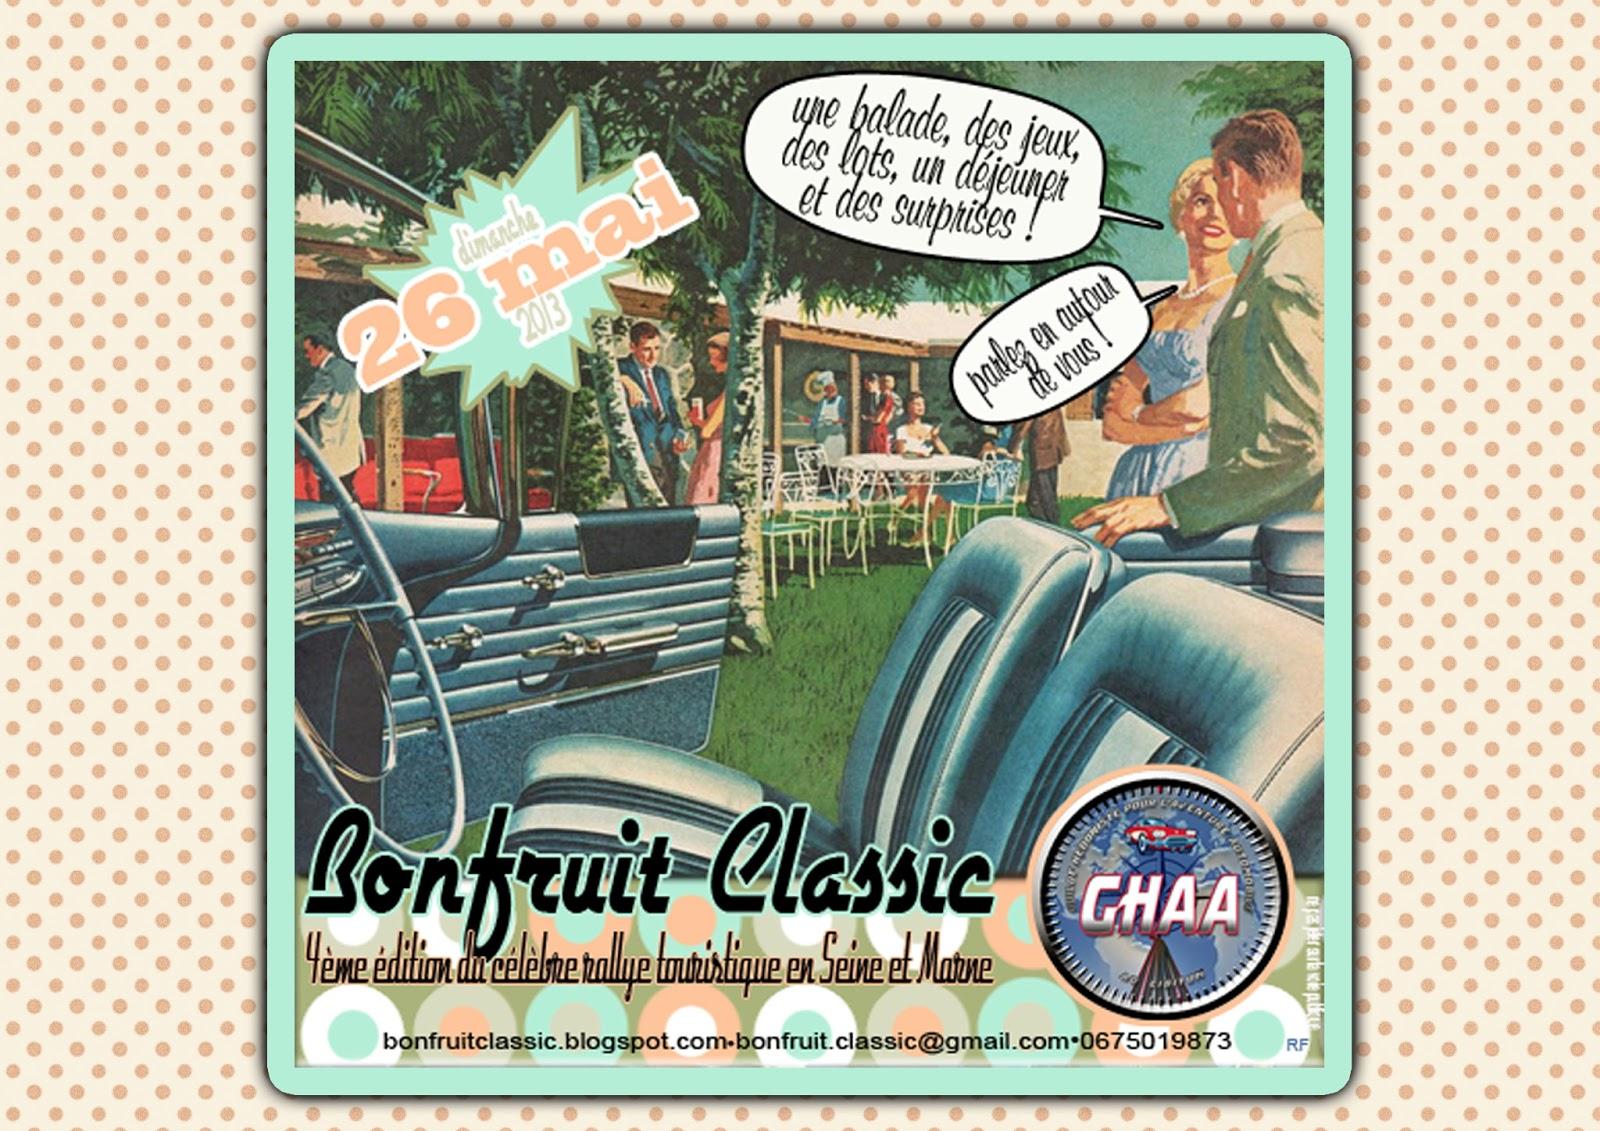 Bonfruit Classic 2013